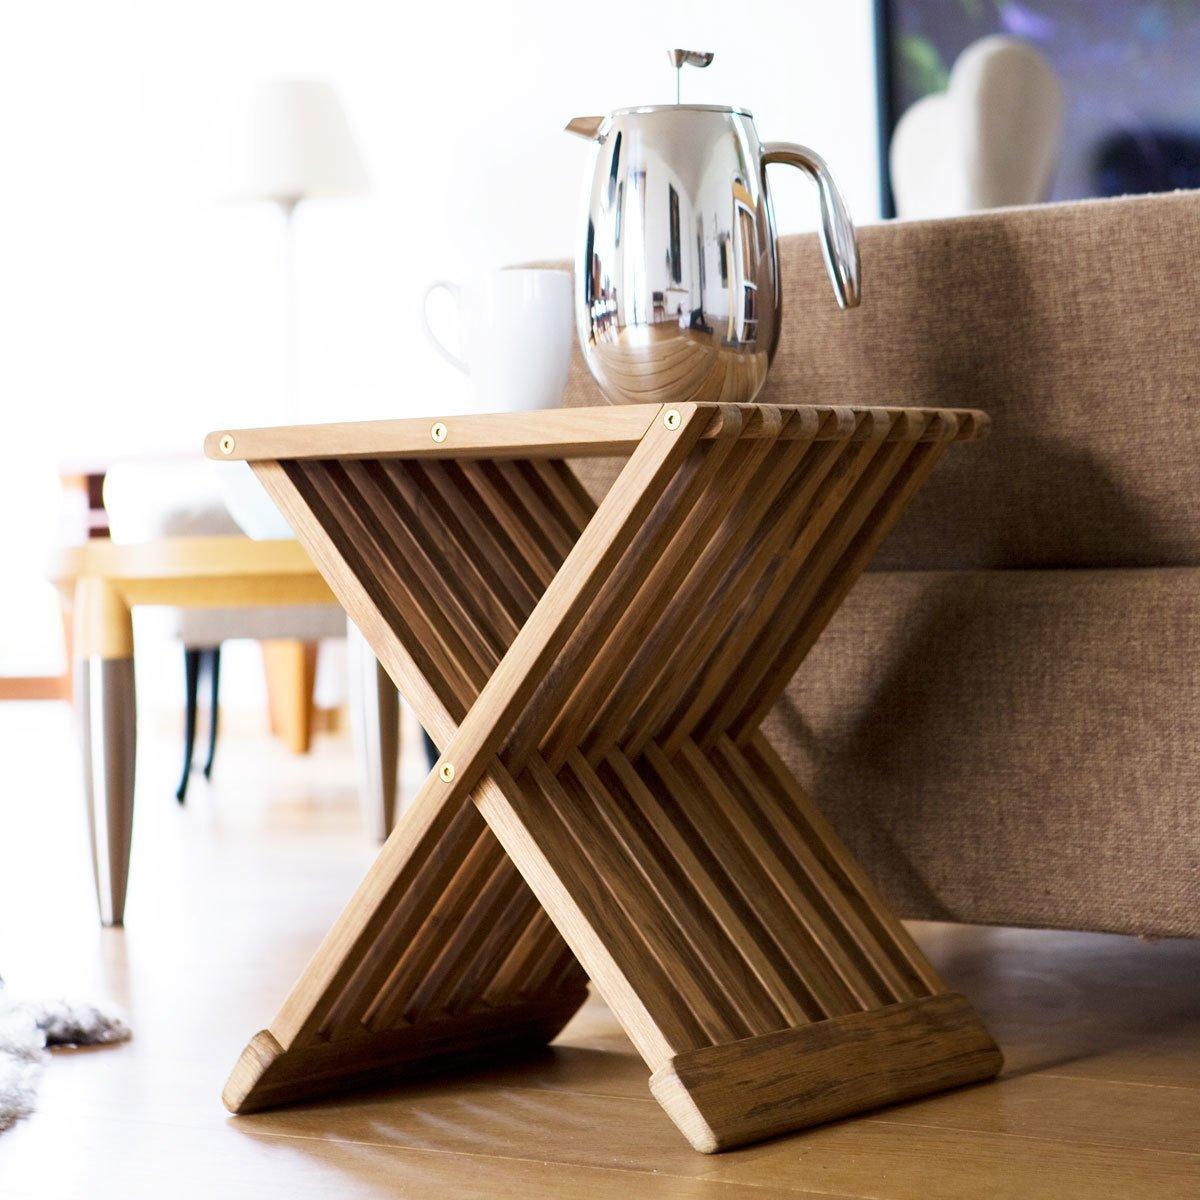 Skagerak Fionia Folding Stool/Table - Black Stained Oak by HORNE - Dwell